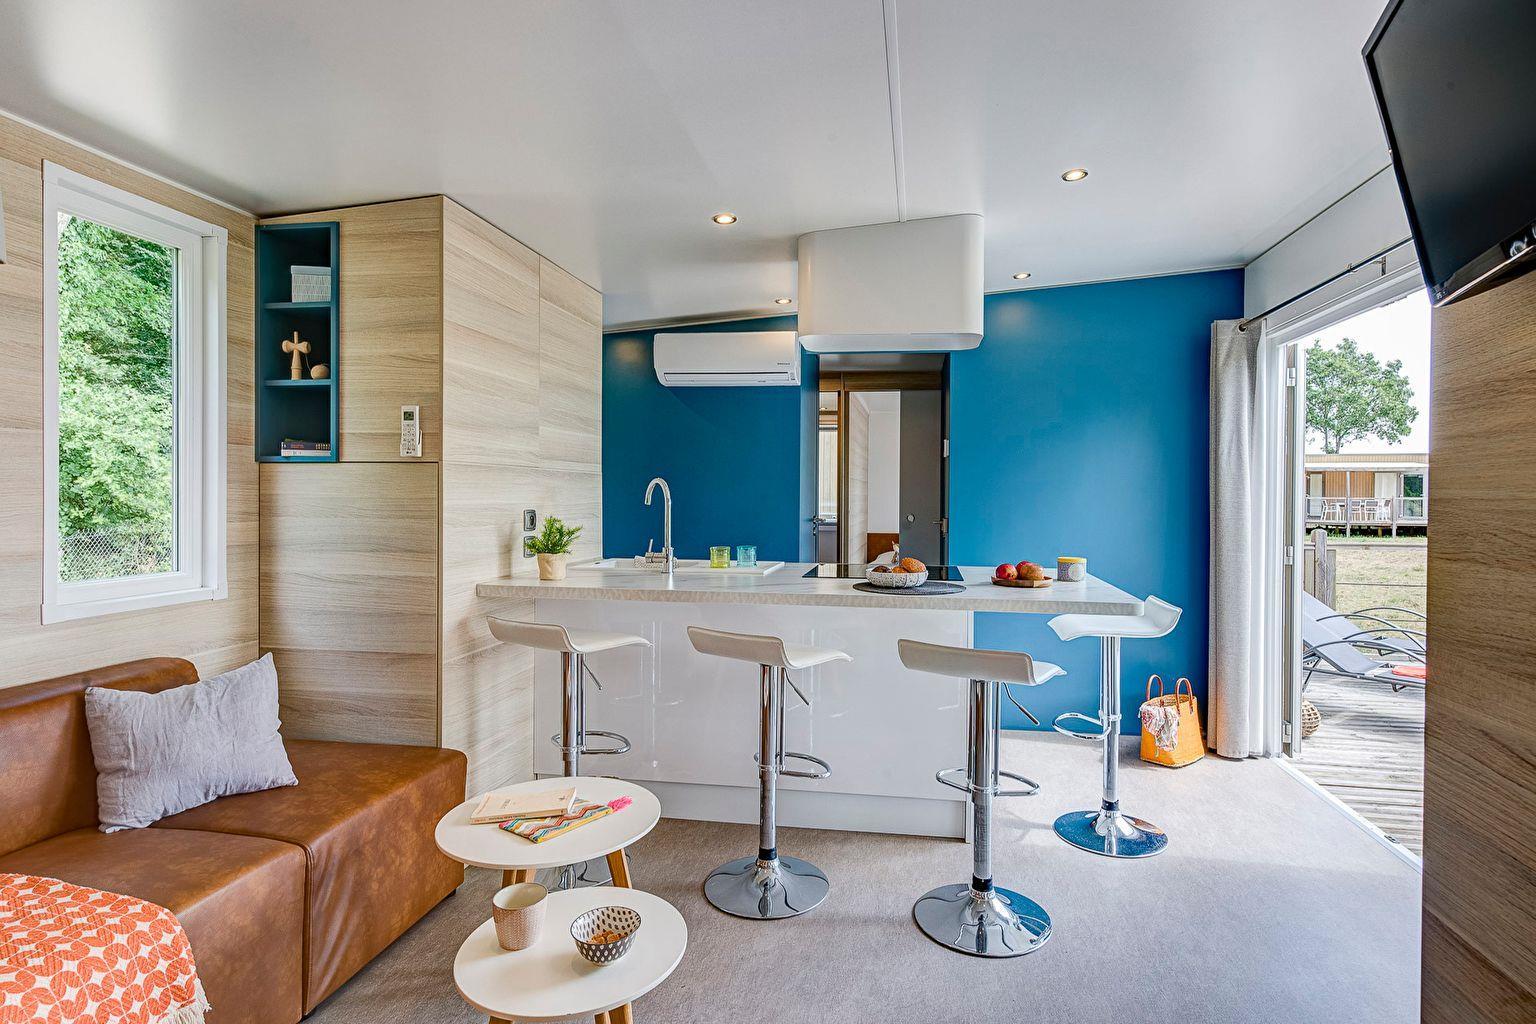 Location - Cottage Key West 3 Chambres - 2 Salles De Bain - Climatisation Premium - Camping Sandaya Les Alicourts Resort